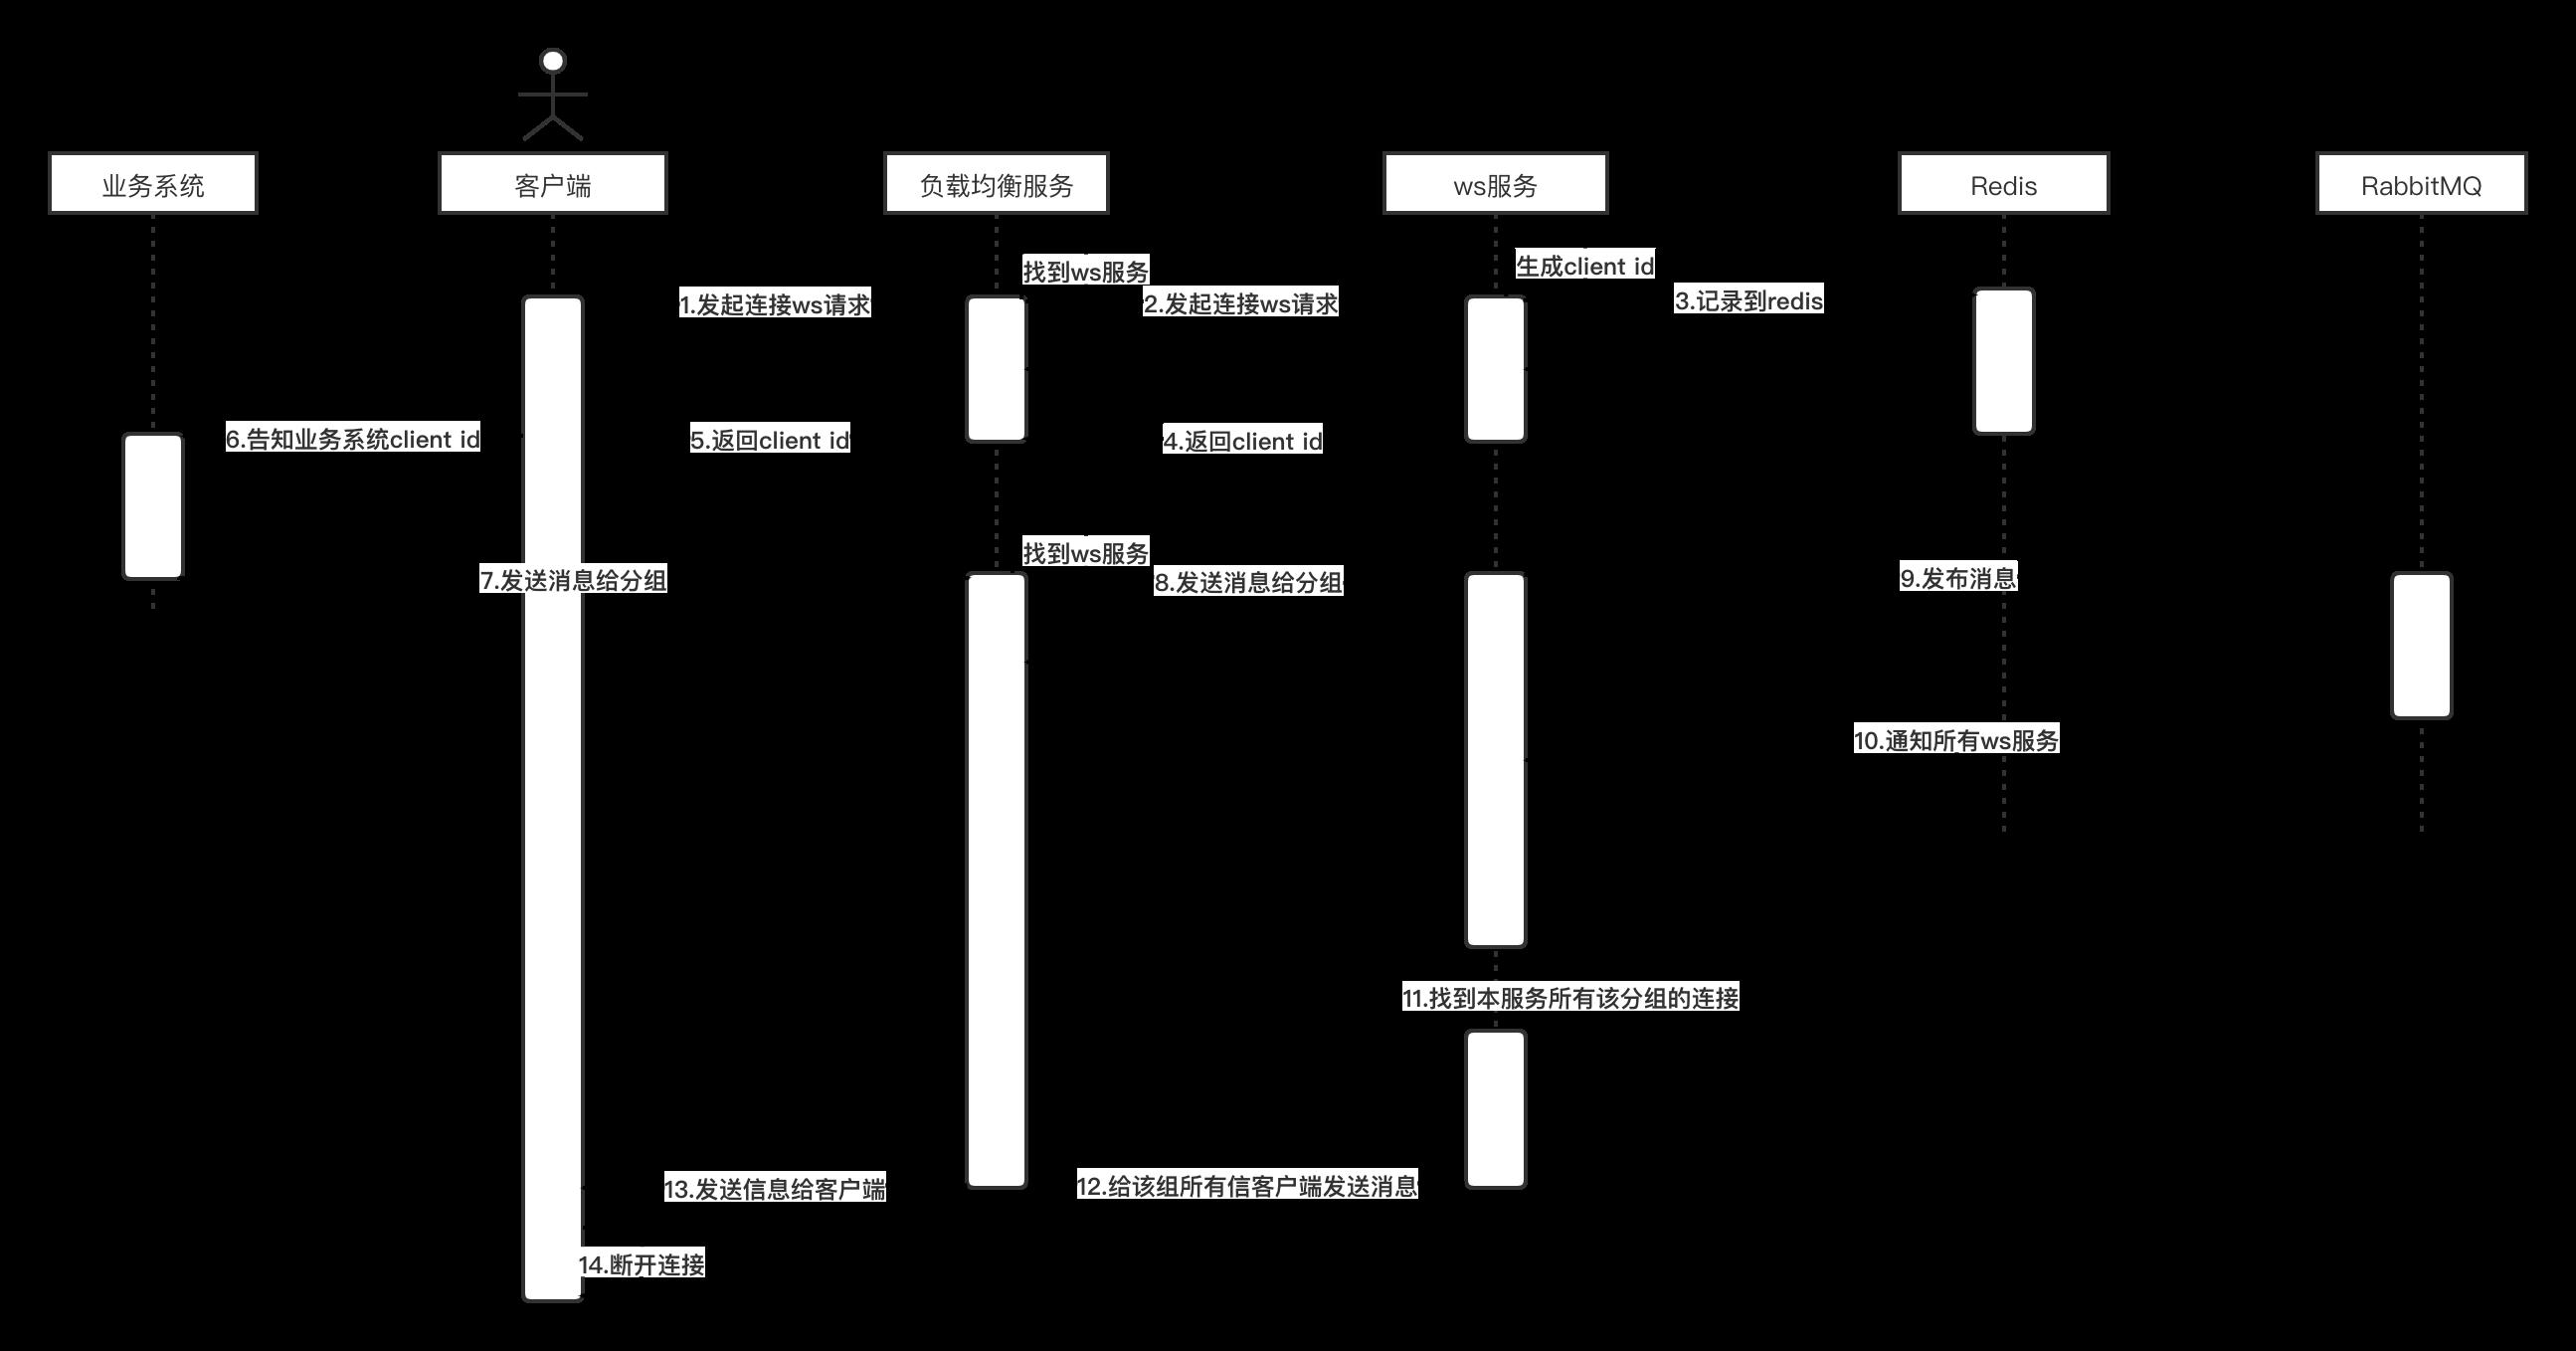 WebSocket微服务群发消息时序图